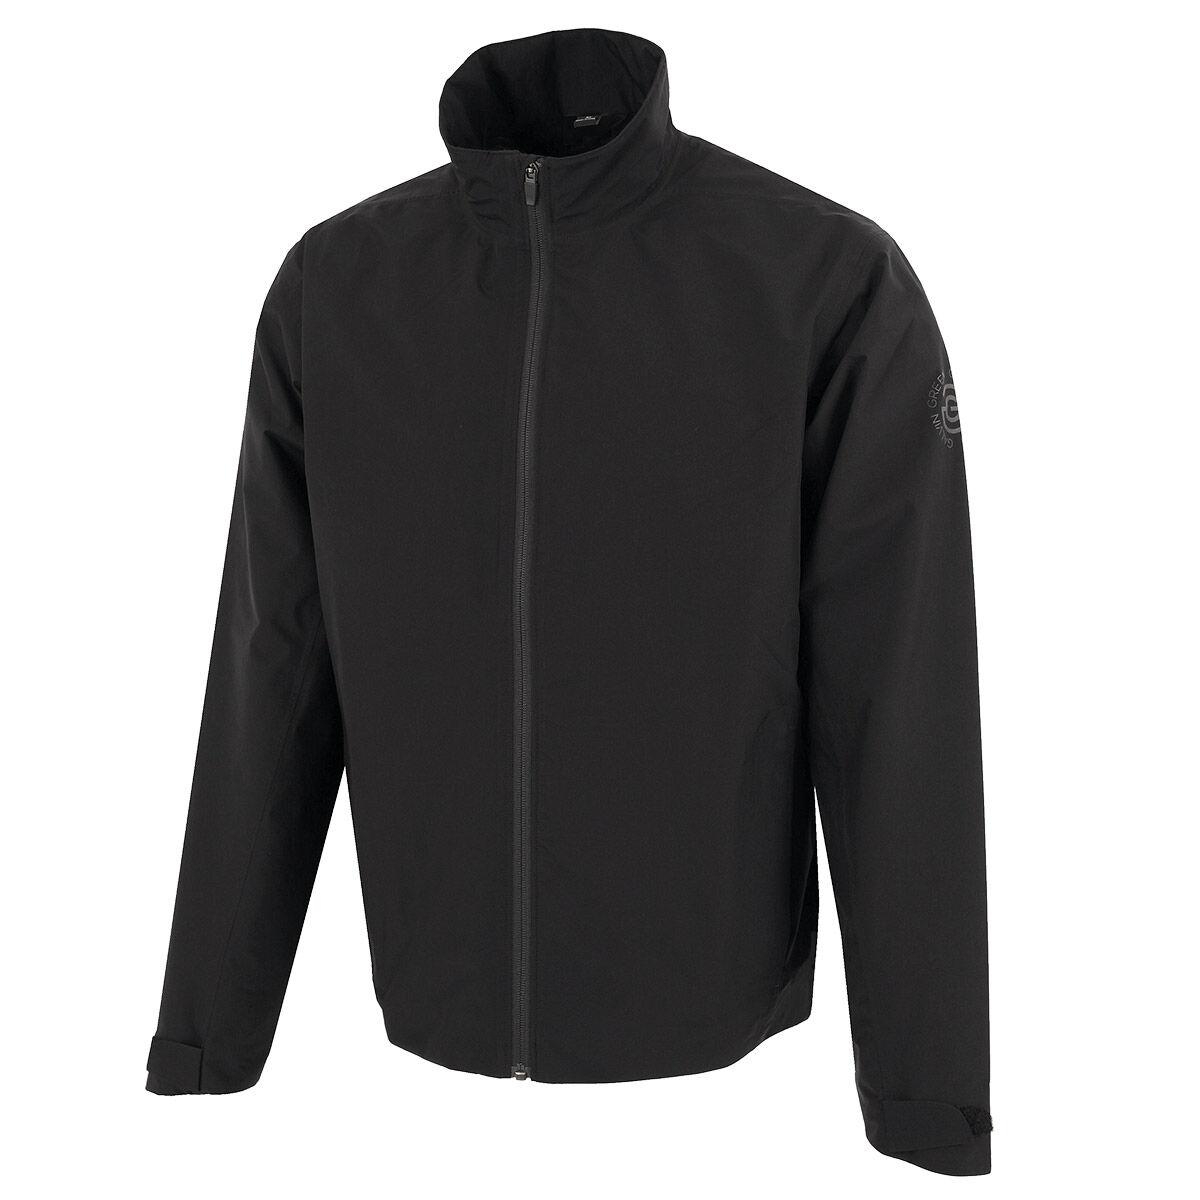 Galvin Green Arlie GORE-TEX Waterproof Golf Jacket, Mens, Small, Black   American Golf